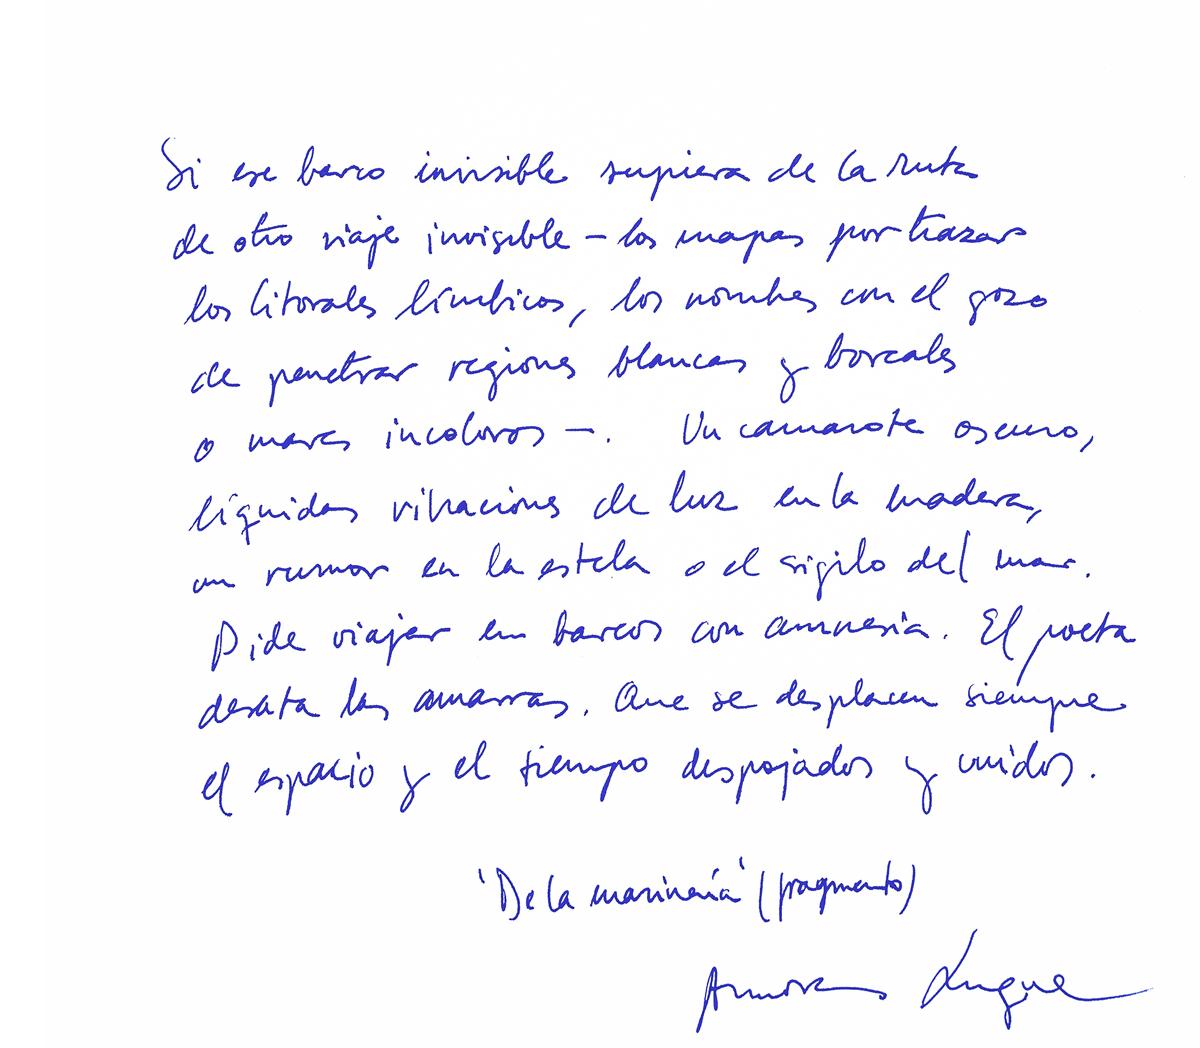 Aurora Luque - Como dos gotas de poesía   - Como dos gotas de poesía, fotografías de LaraBisbe